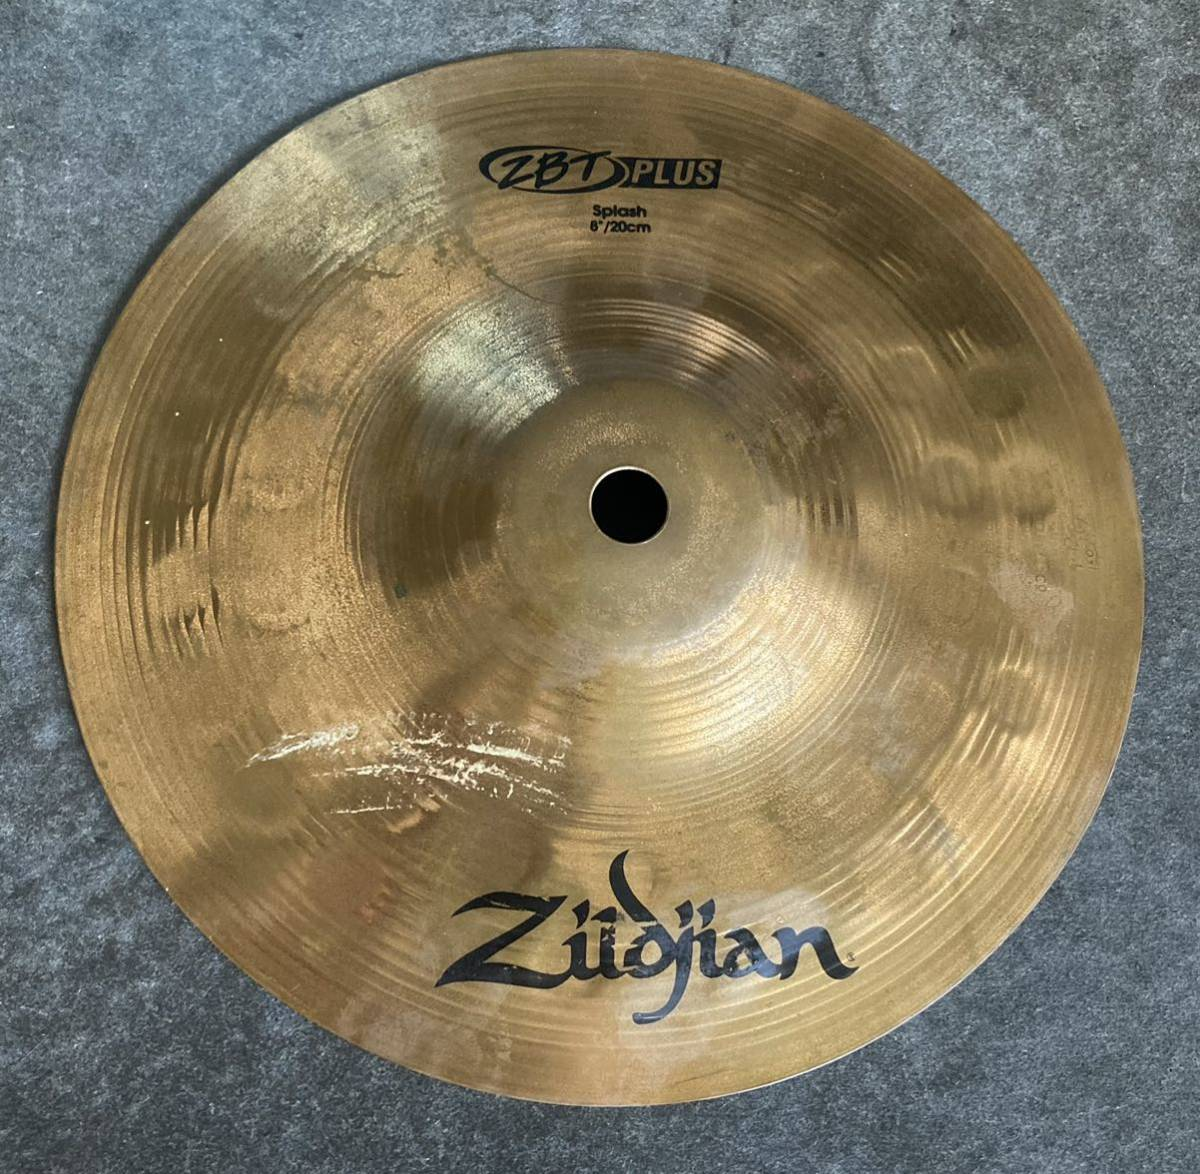 Zildjian ジルジャン ZBT PLUS 20 ハイハット ジャンク品 送料無料_画像1